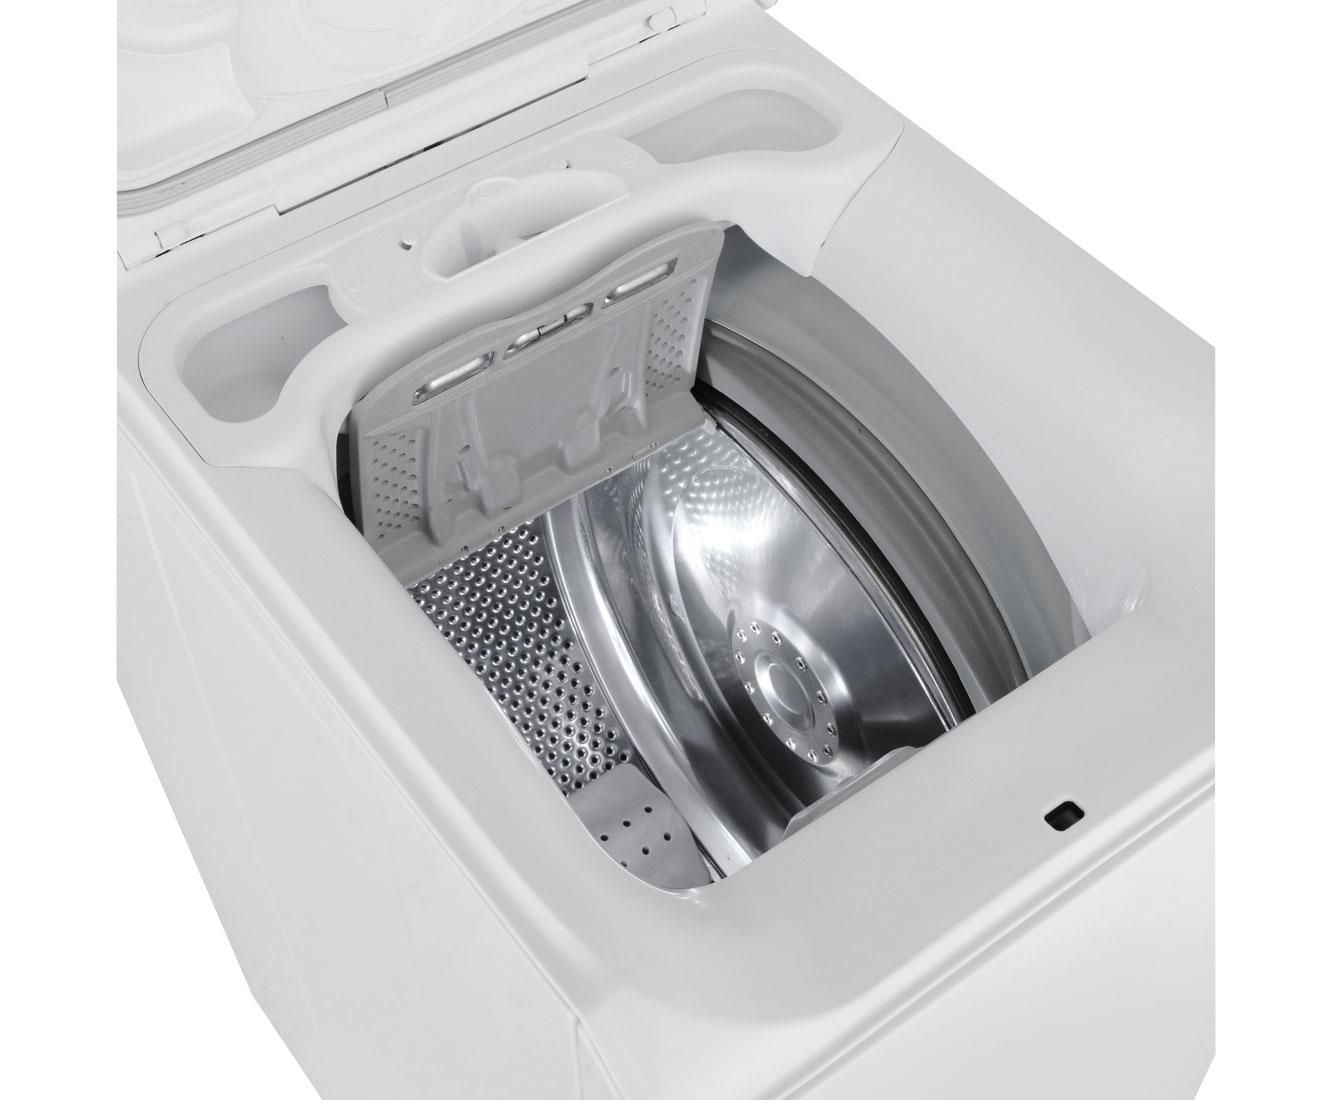 Aeg lavamat l tl waschmaschine toplader kg a